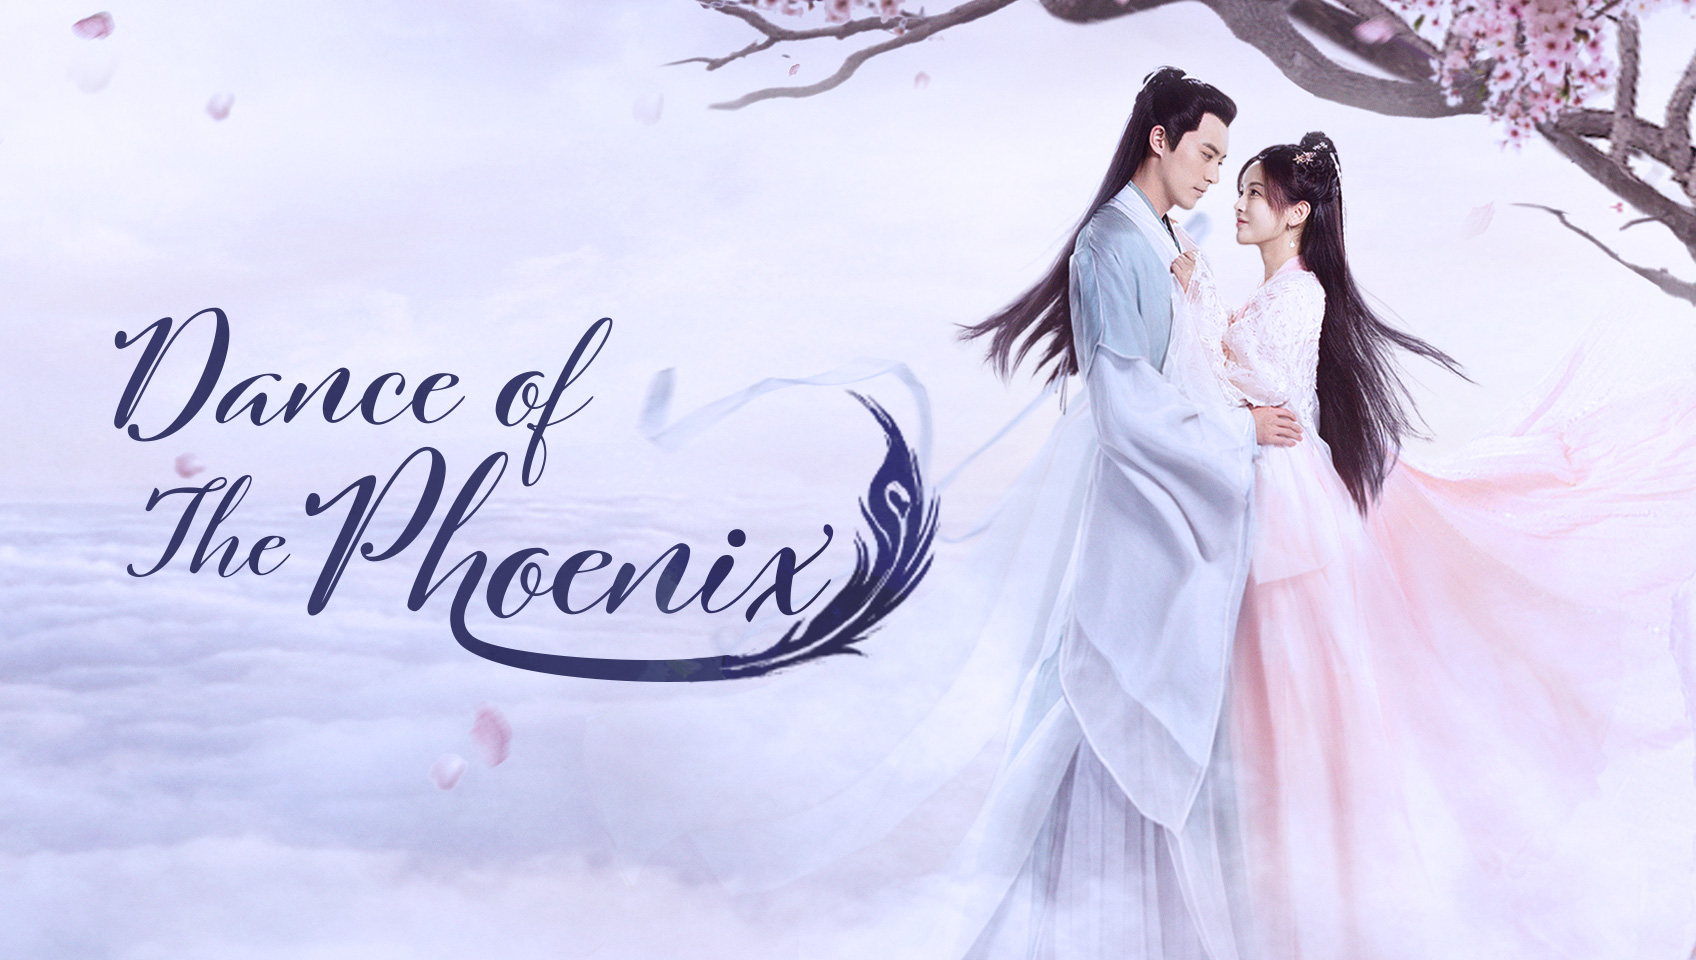 Dance of The Phoenix poster